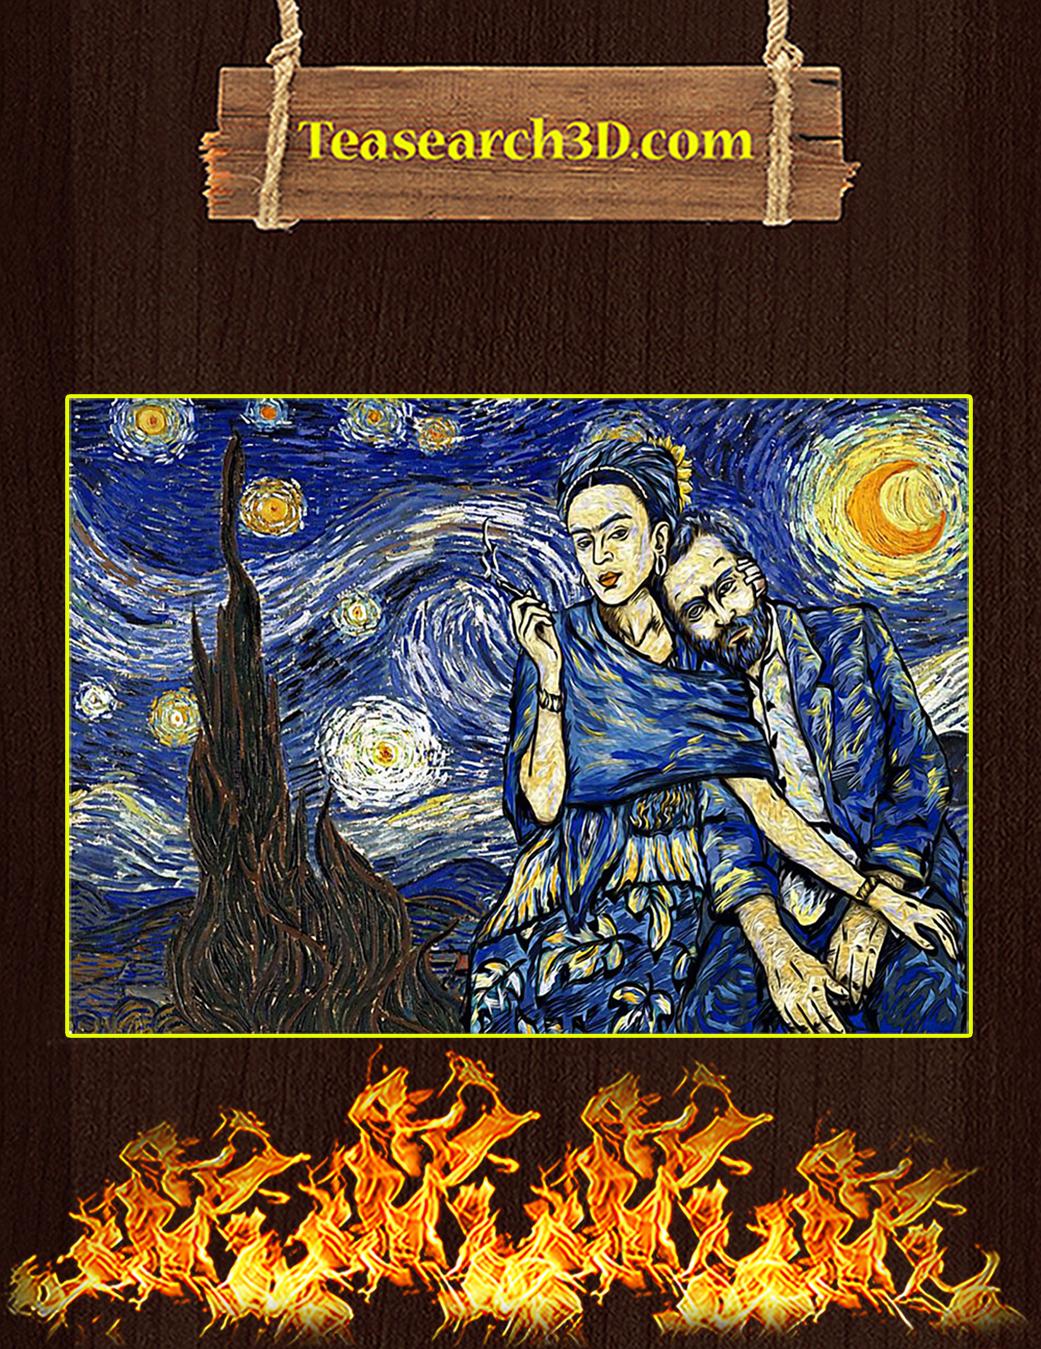 Frida Kahlo Van Gogh Starry Night Poster A1